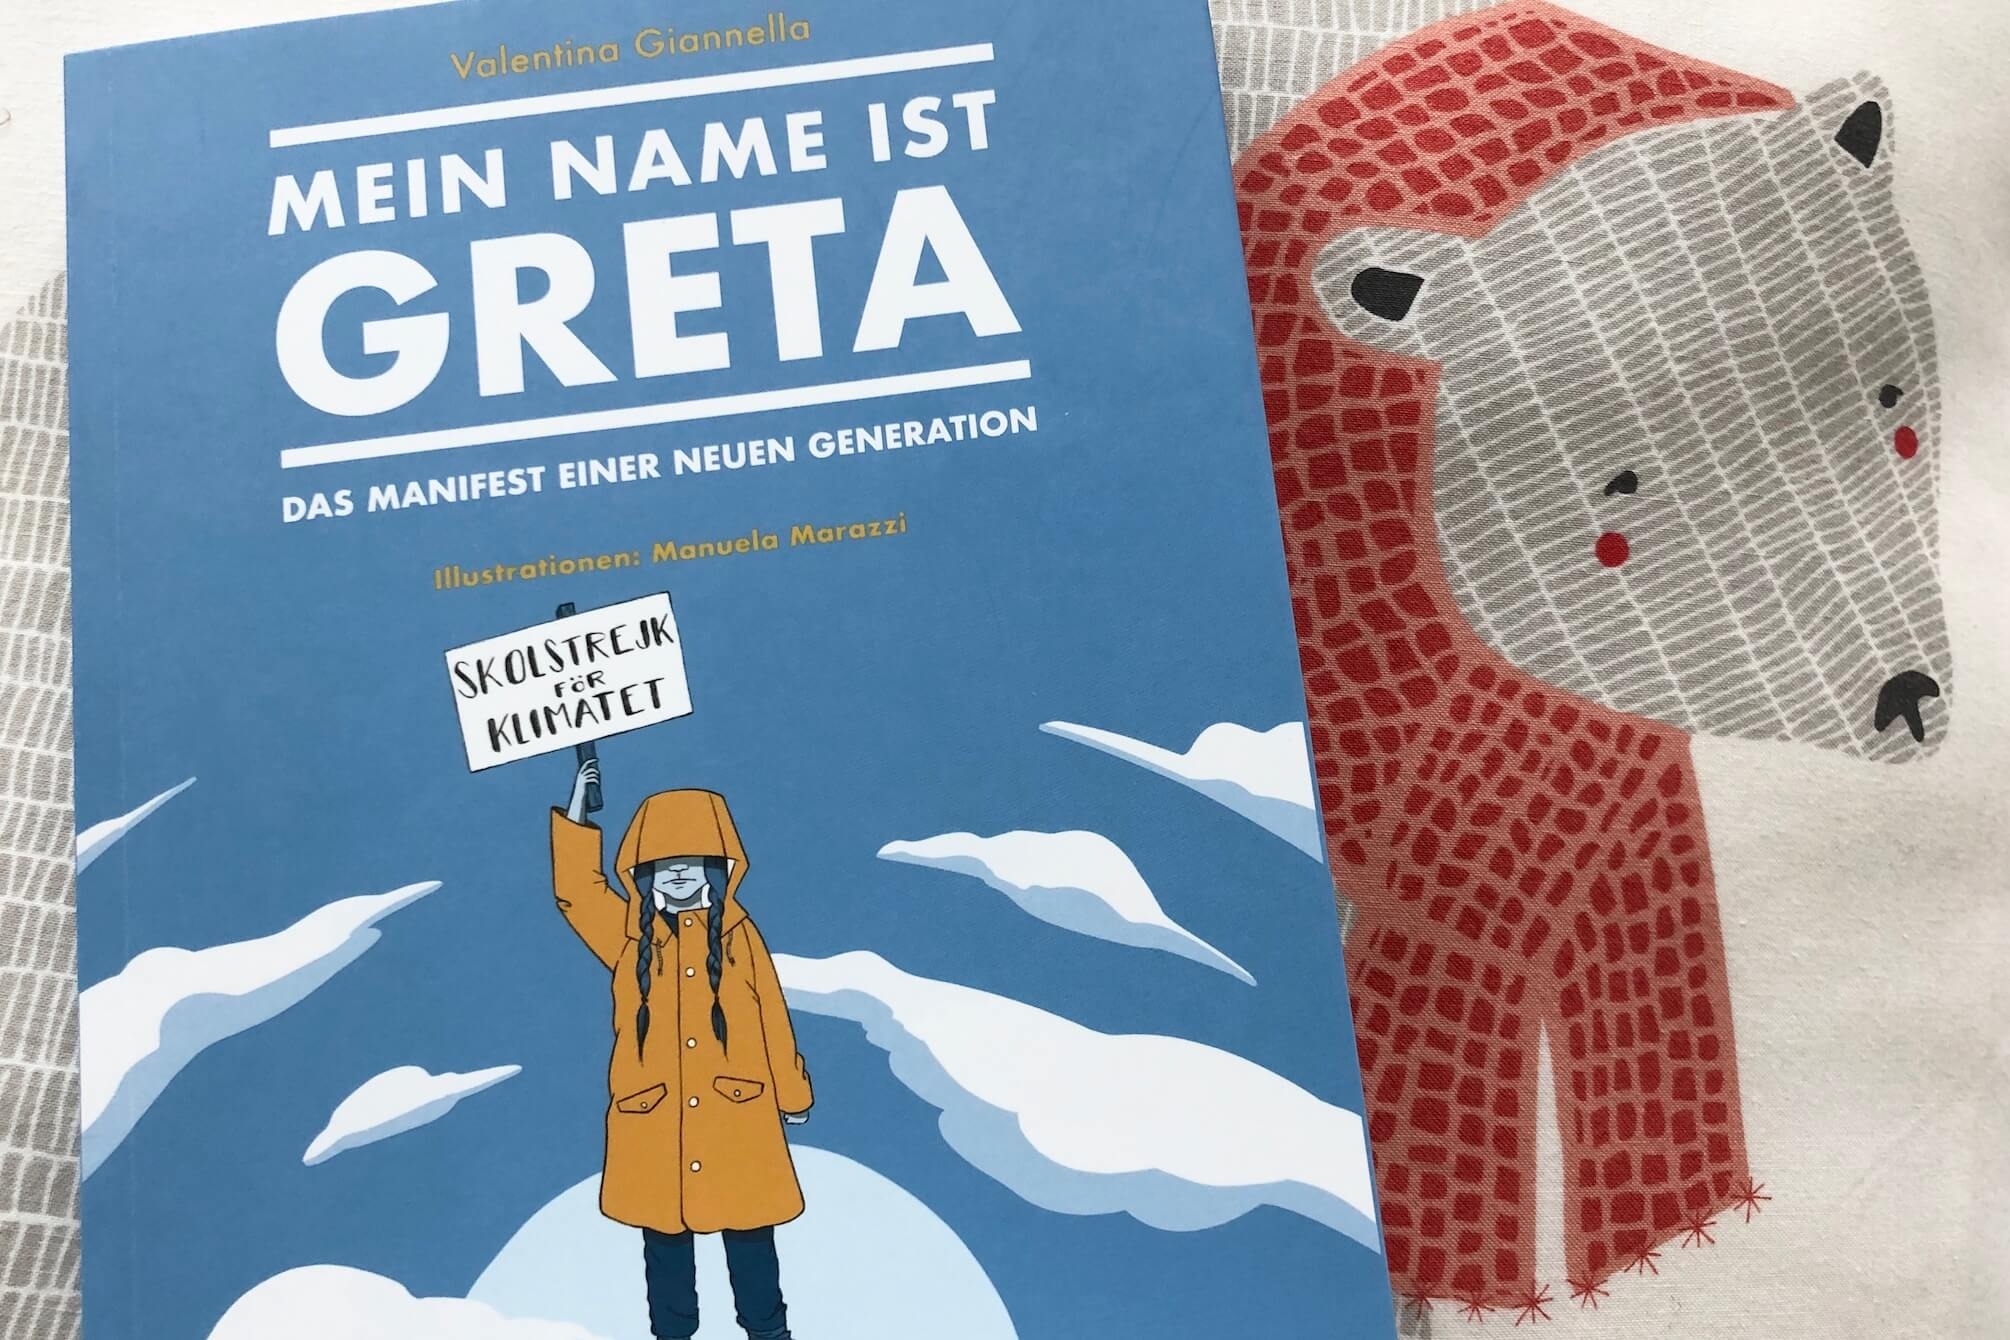 Mein Name ist Greta - www.expatmamas.de/blog/ #expatmamas #imauslandzuhause #klimawandel